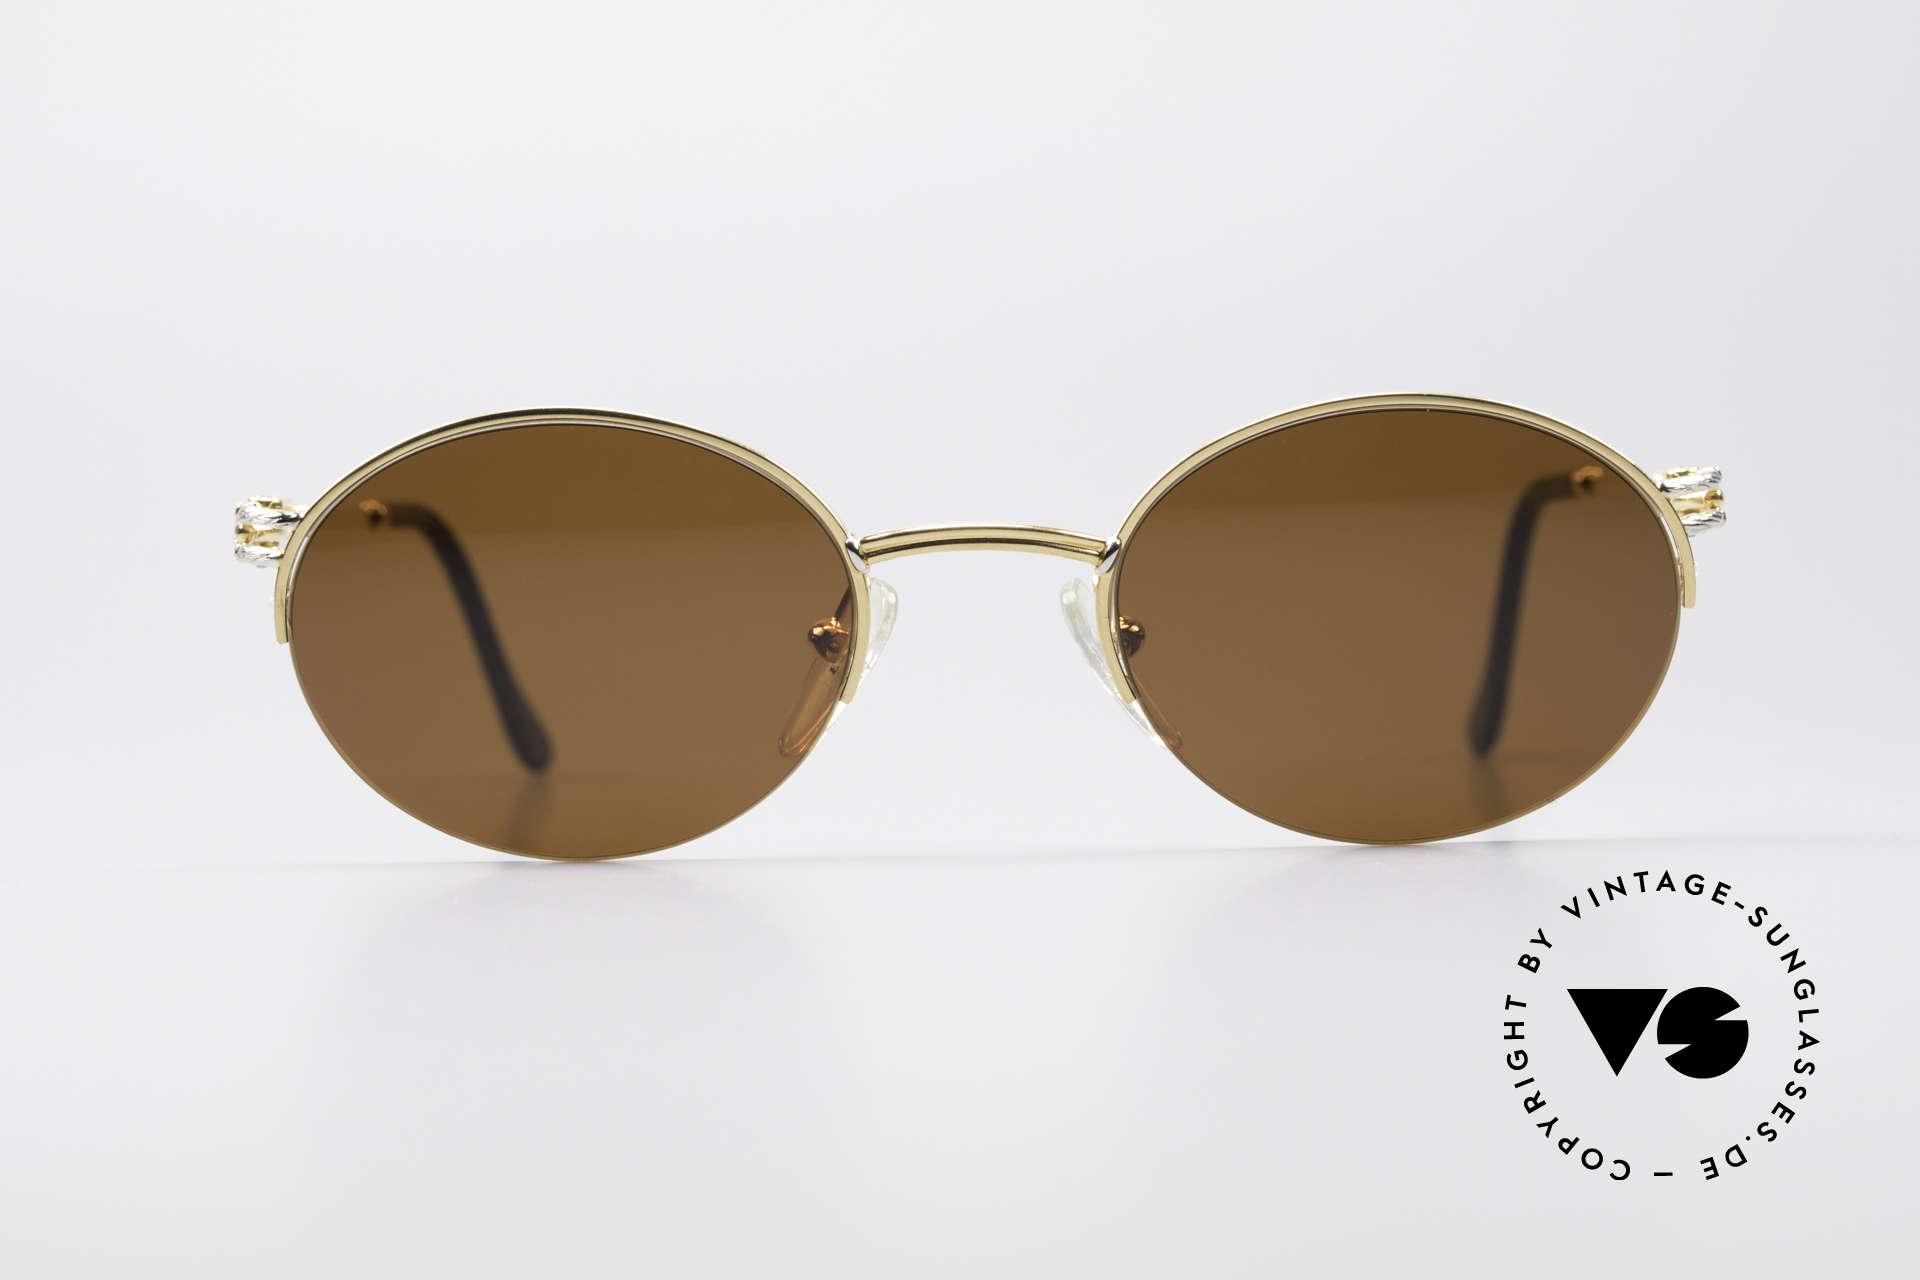 30131205b1 Sunglasses Fred Feroe Oval Luxury Sunglasses